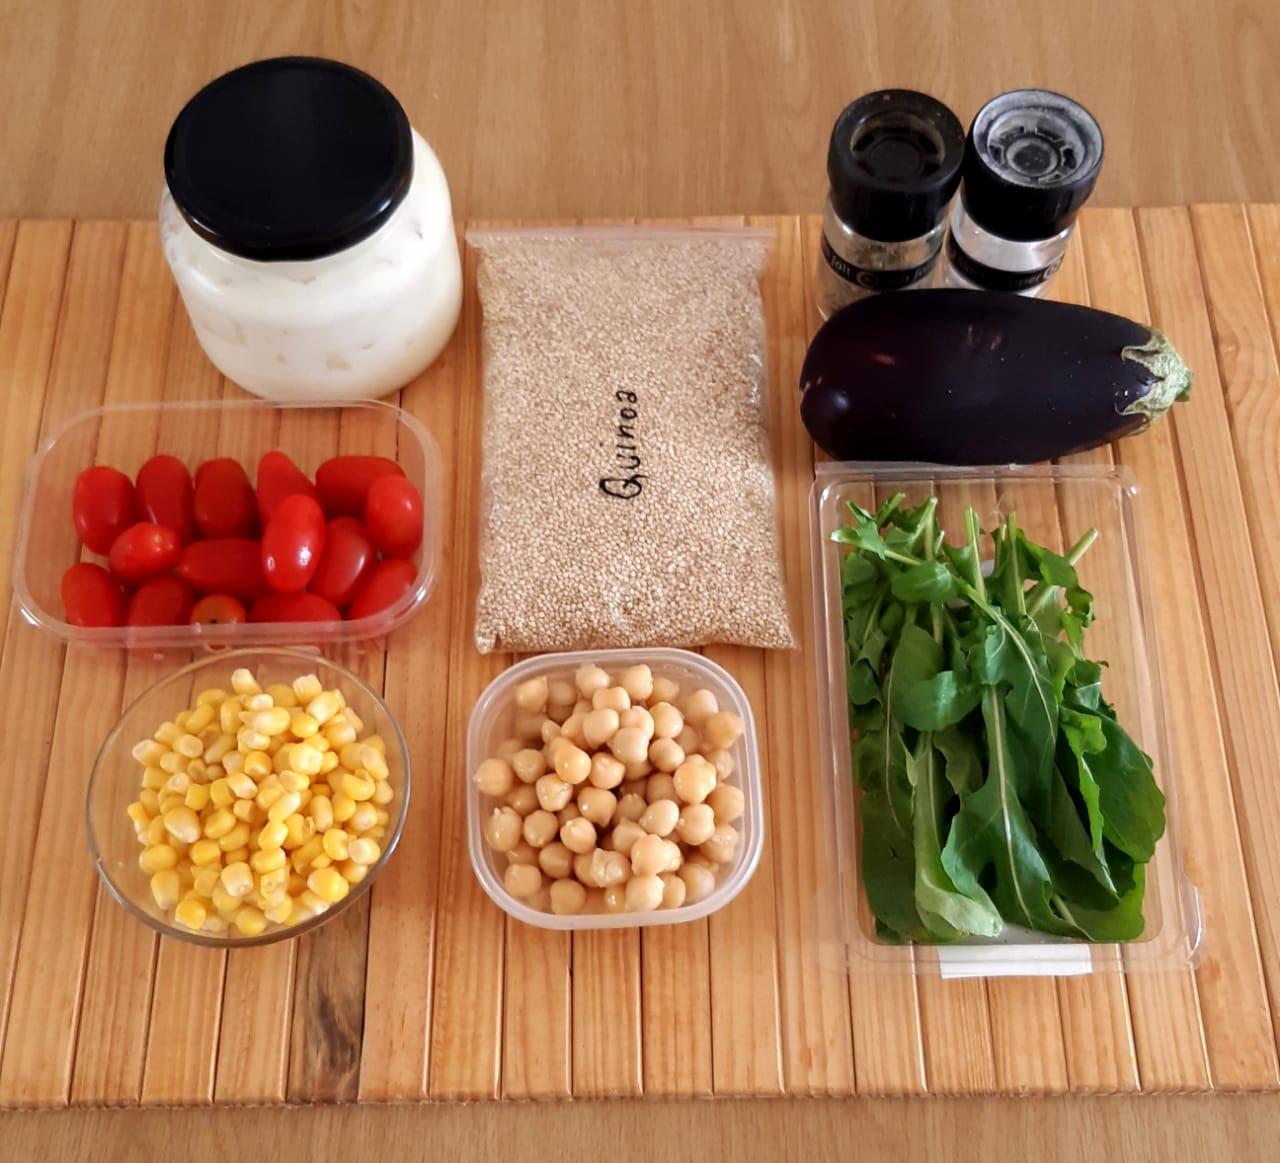 1 Chickpea Salad Ingredients